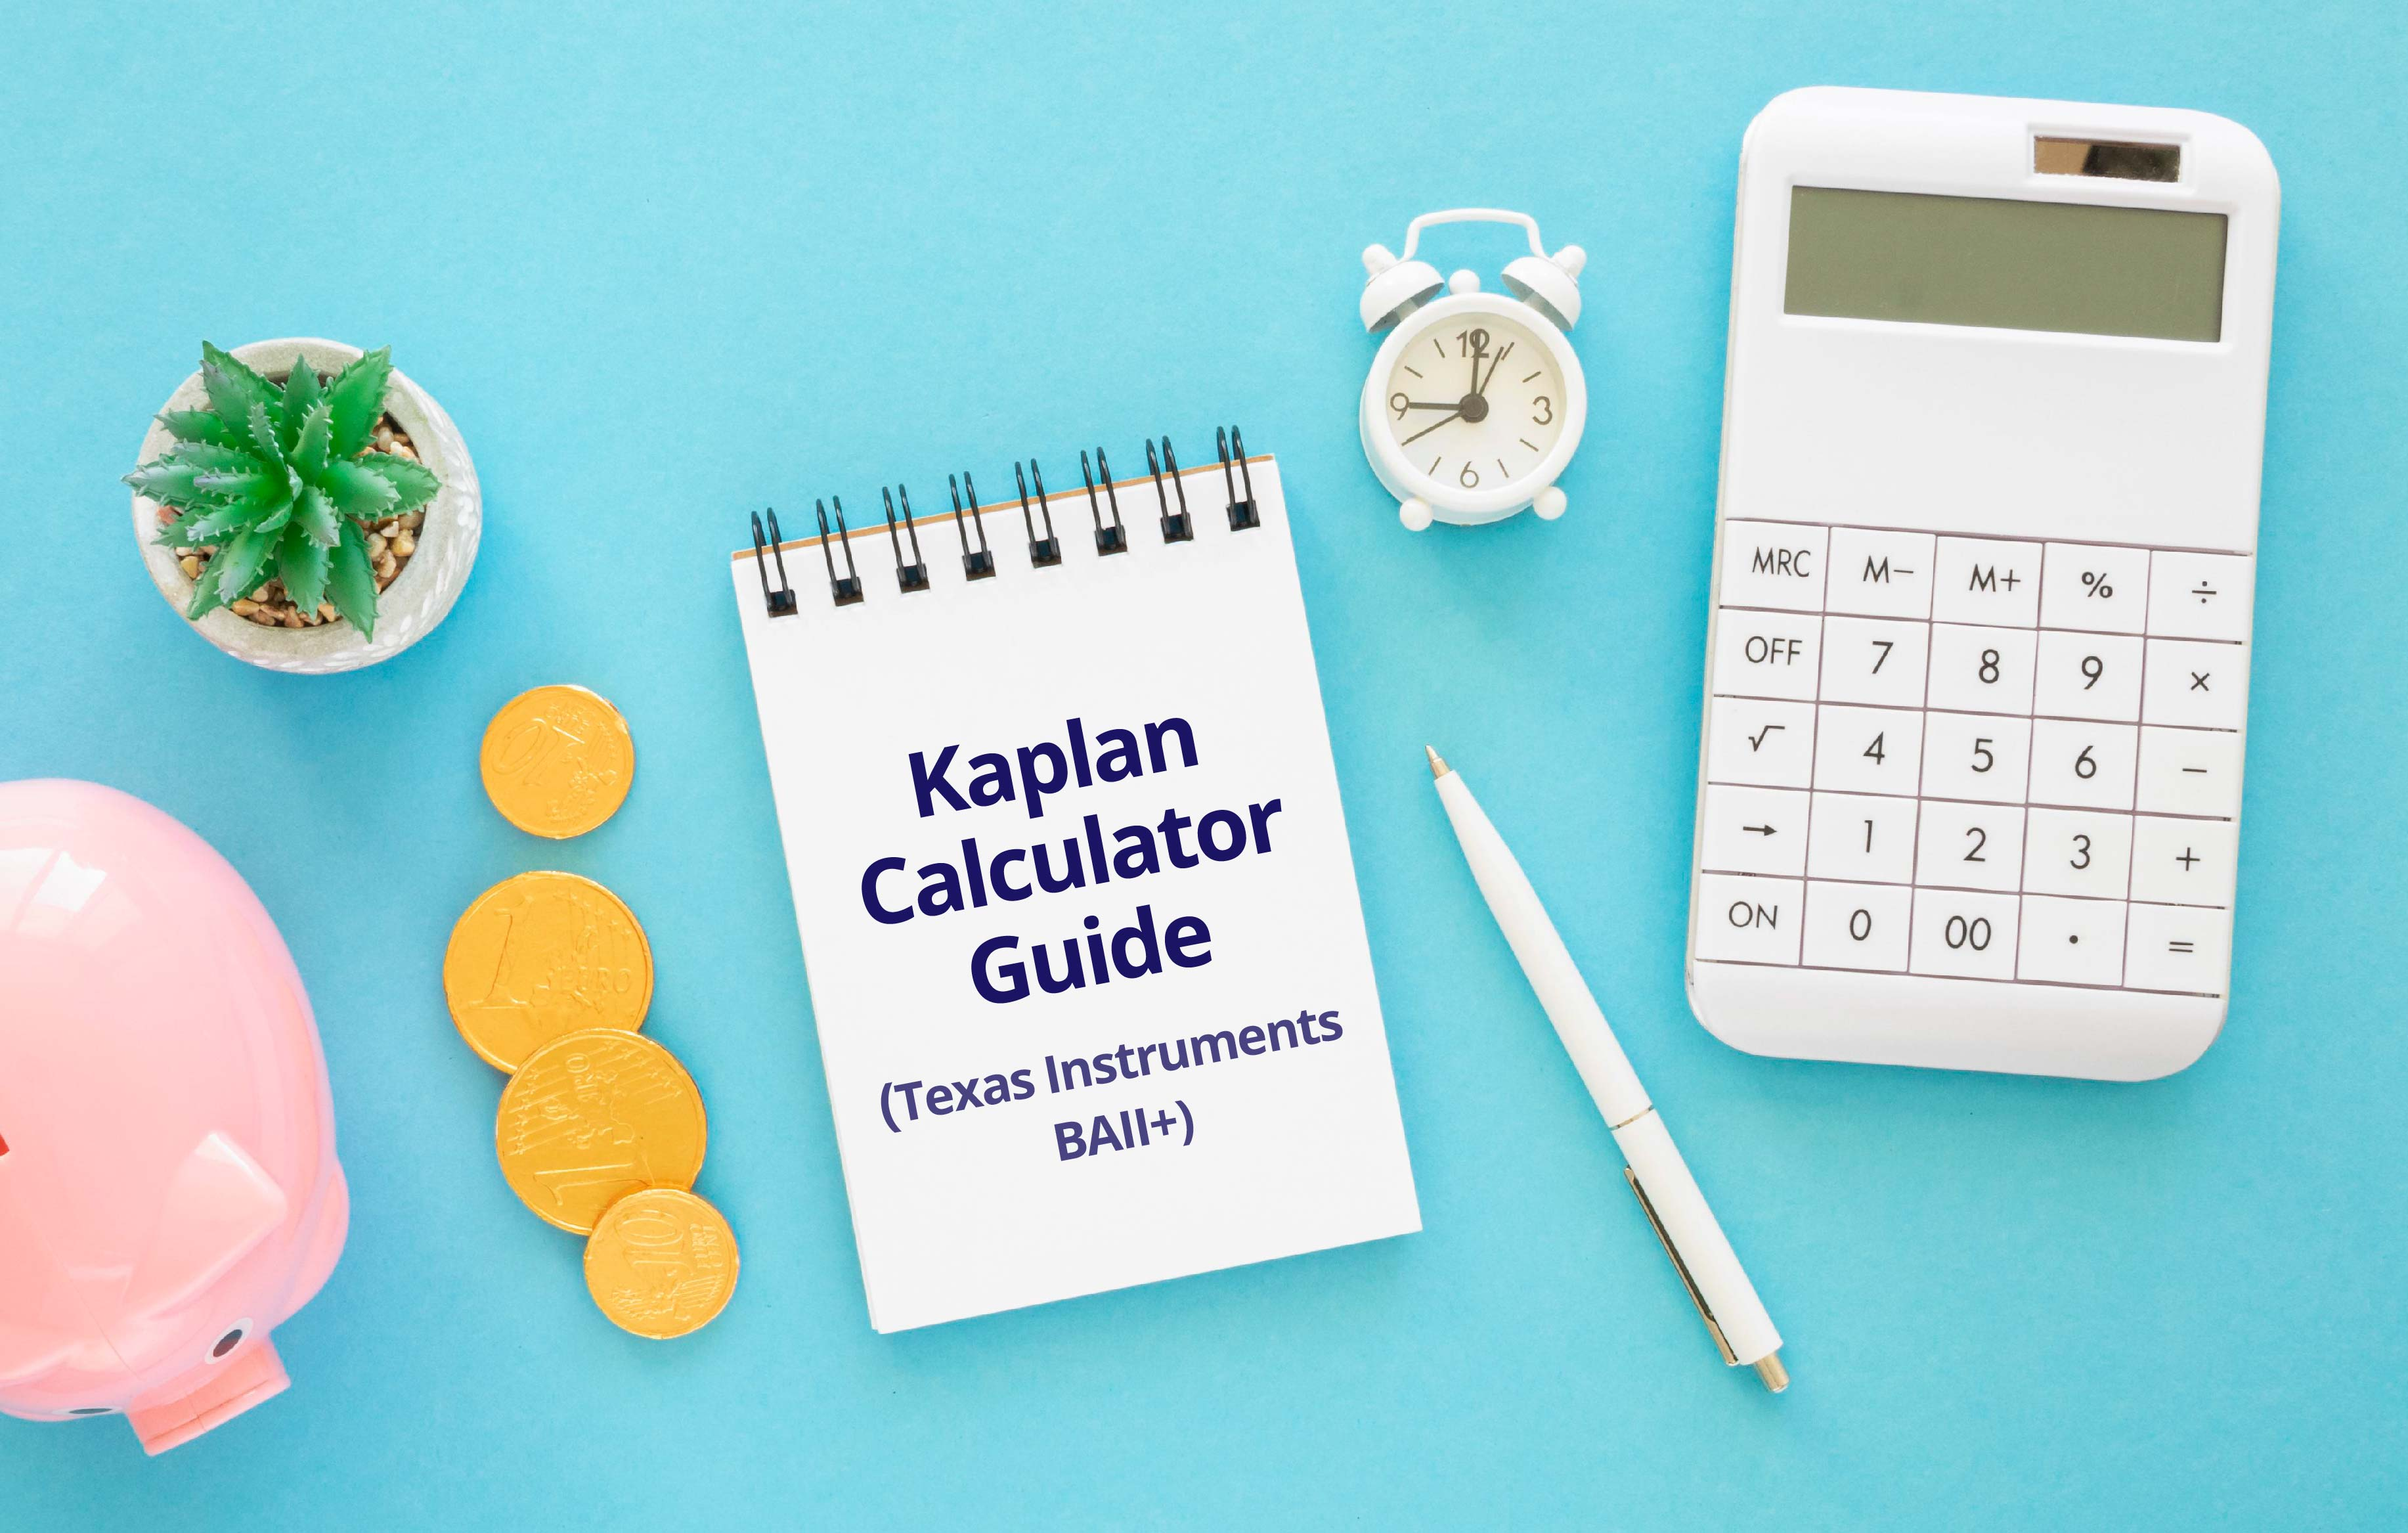 Course Image Kaplan Calculator Guide (Texas Instruments BAII+)